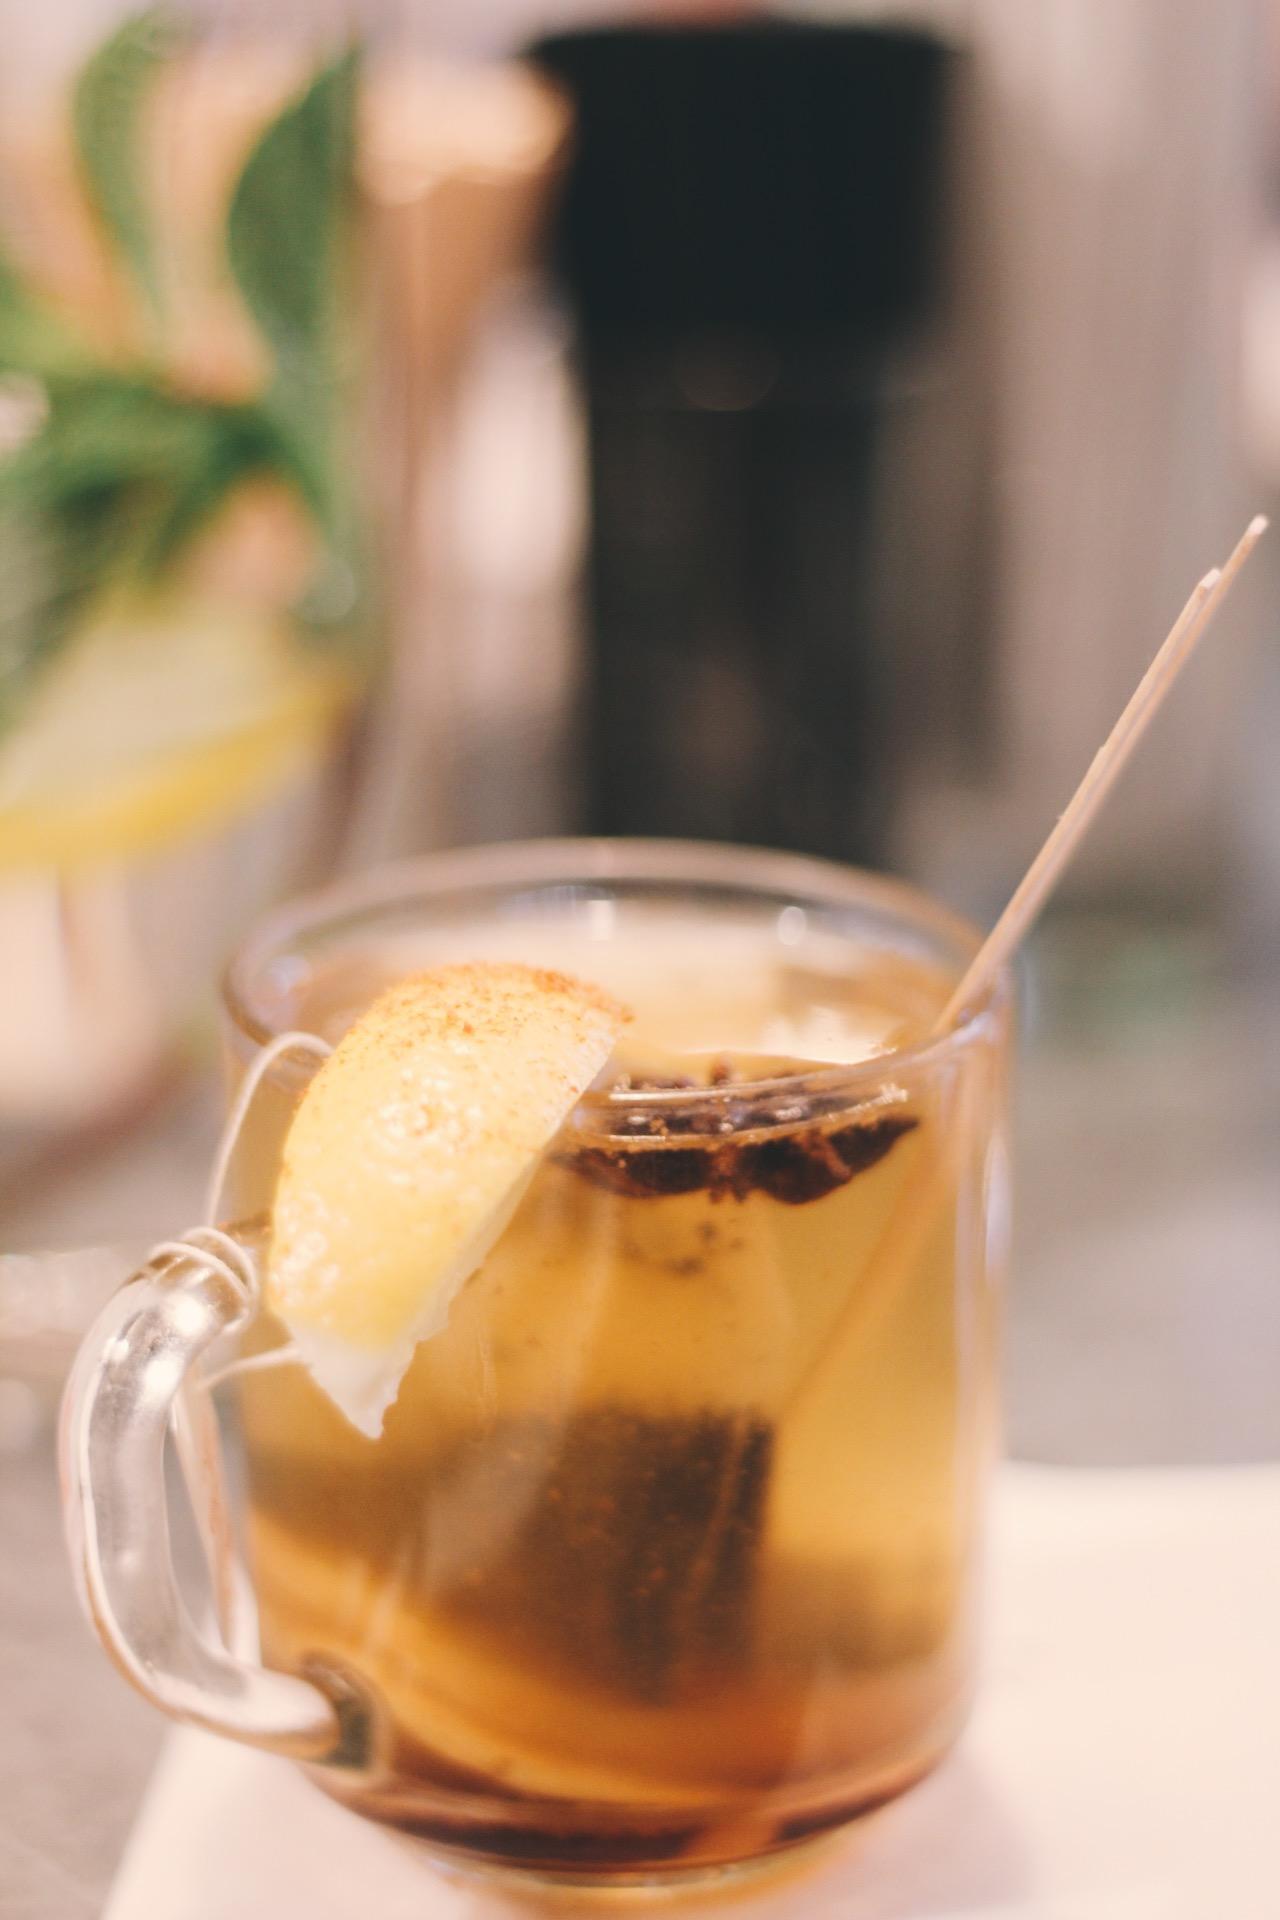 Soho-NYC-Cafe-integral-egg-shop-asos-trench-turtleneck-maxi-dress-hue-tights-patent-bucket-bag-14.JPG